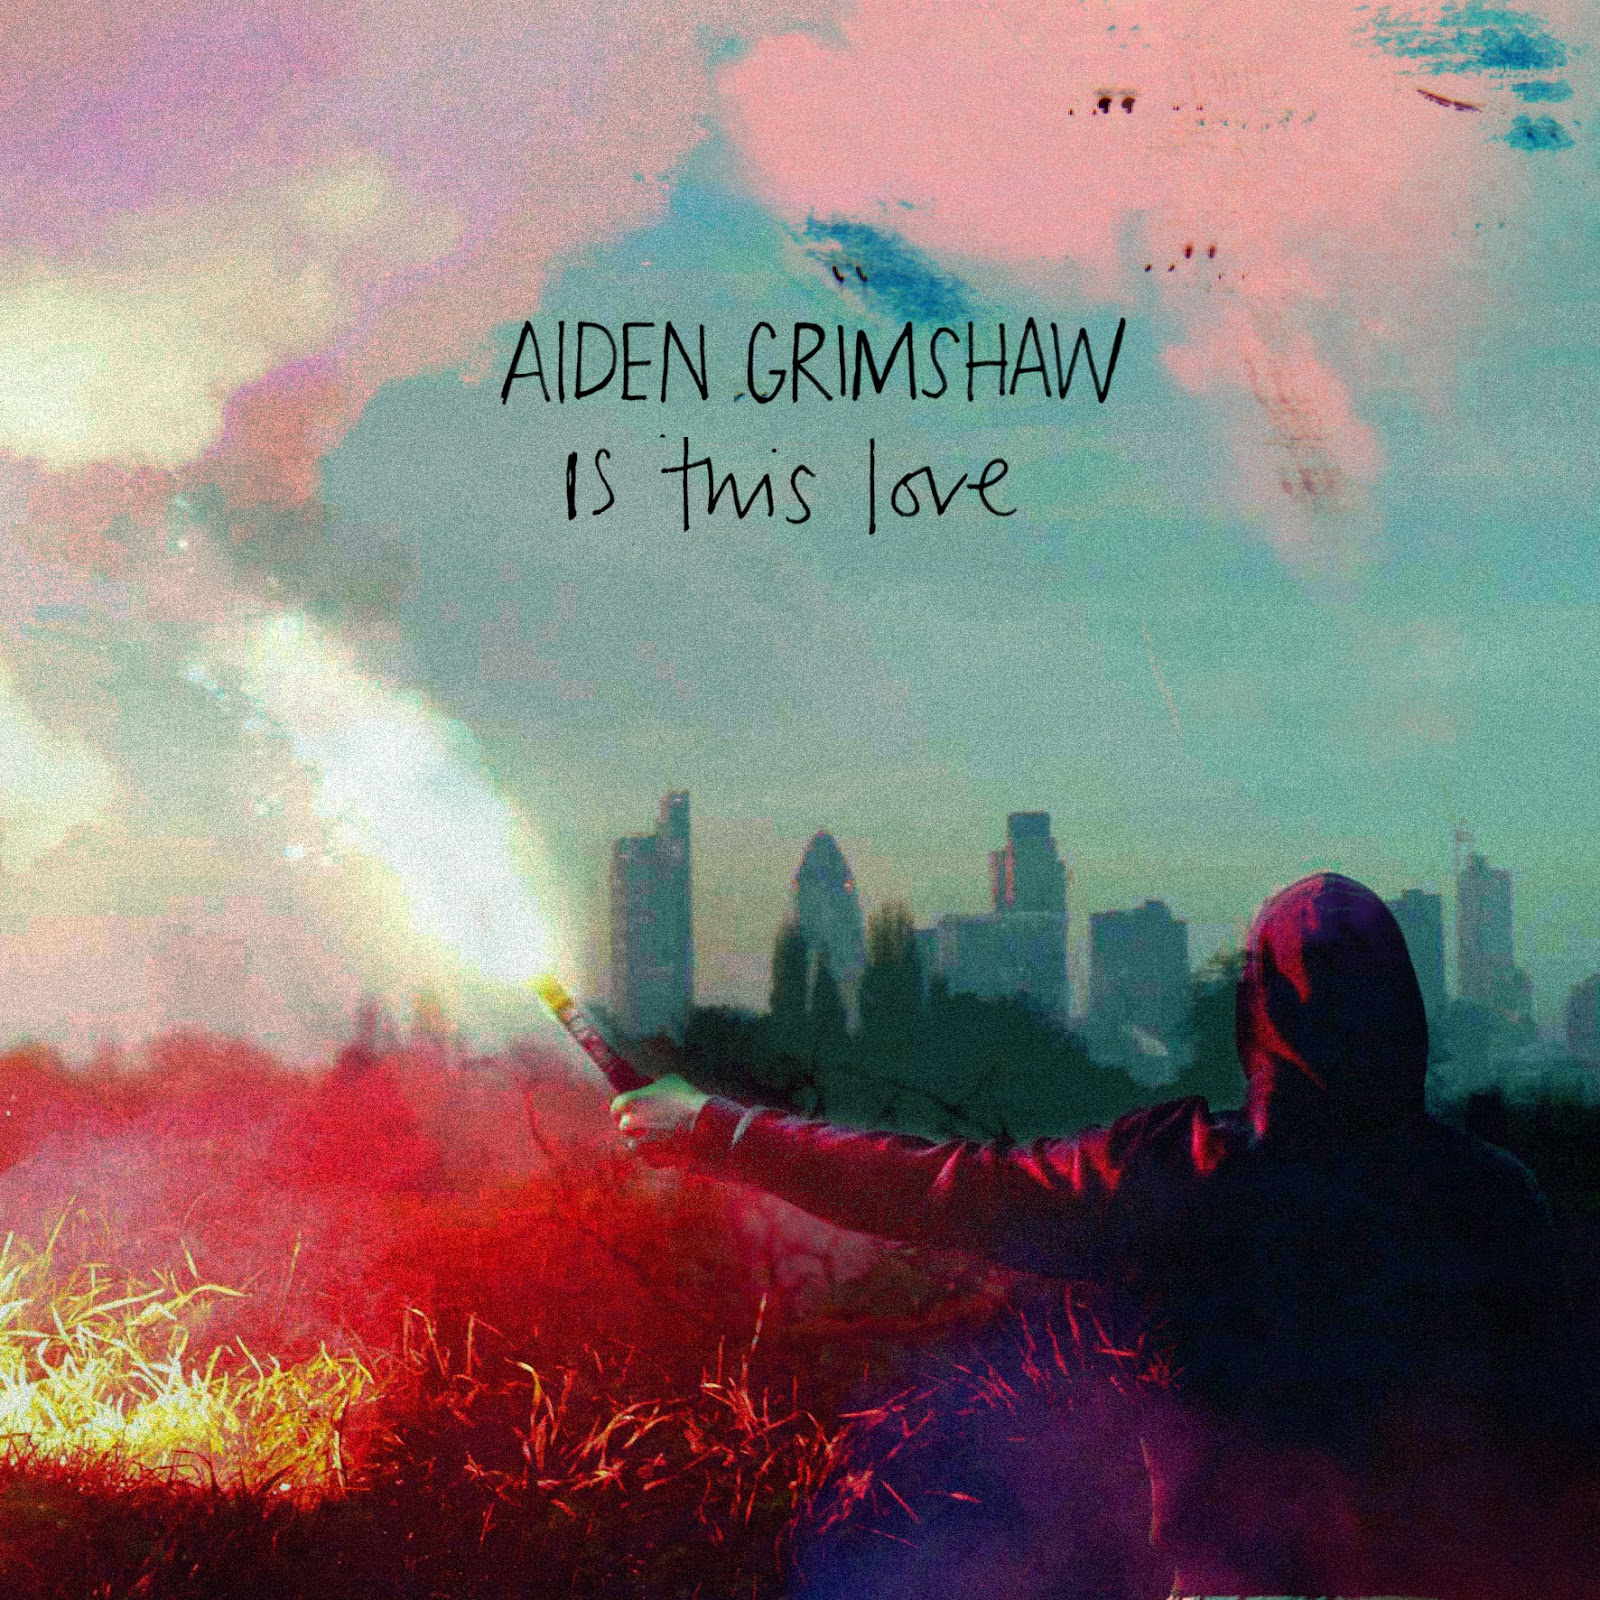 http://3.bp.blogspot.com/-dXwr1DBvubE/T5DOAN21zTI/AAAAAAAAA5I/-59W4tPtOpk/s1600/Aiden+Grimshaw+-+Is+This+Love.jpg